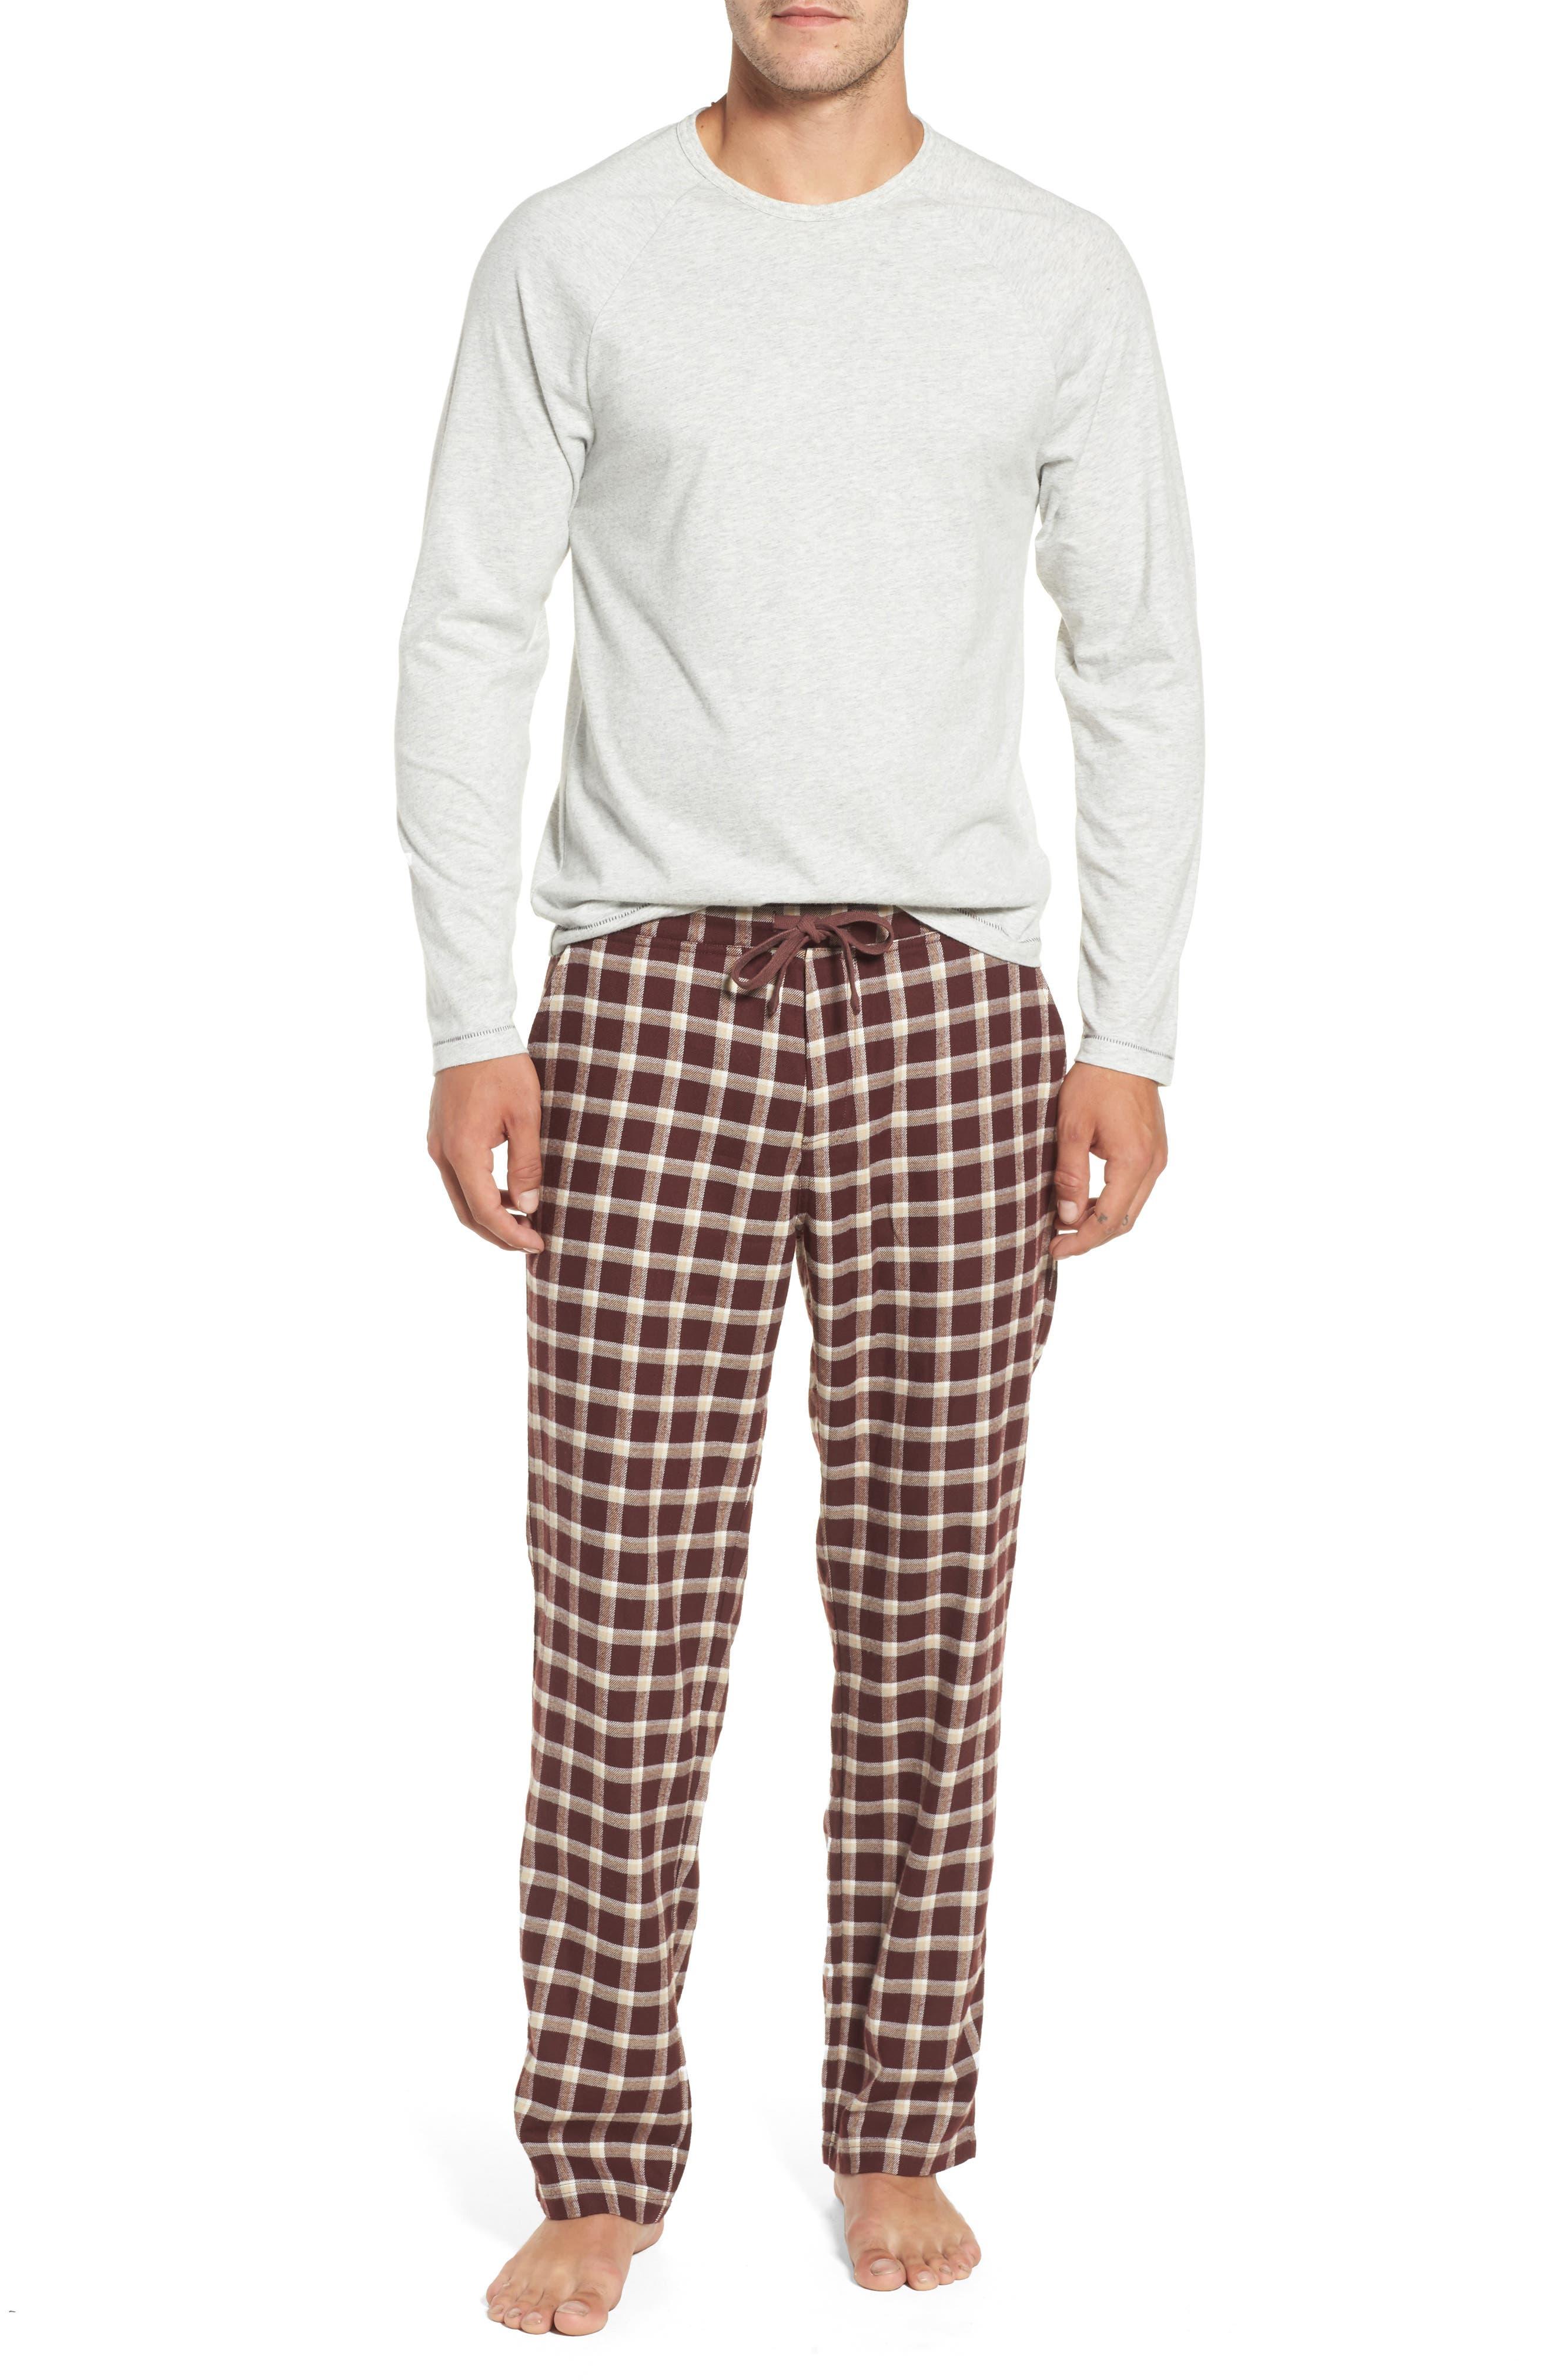 Main Image - UGG® Steiner Pajama Set